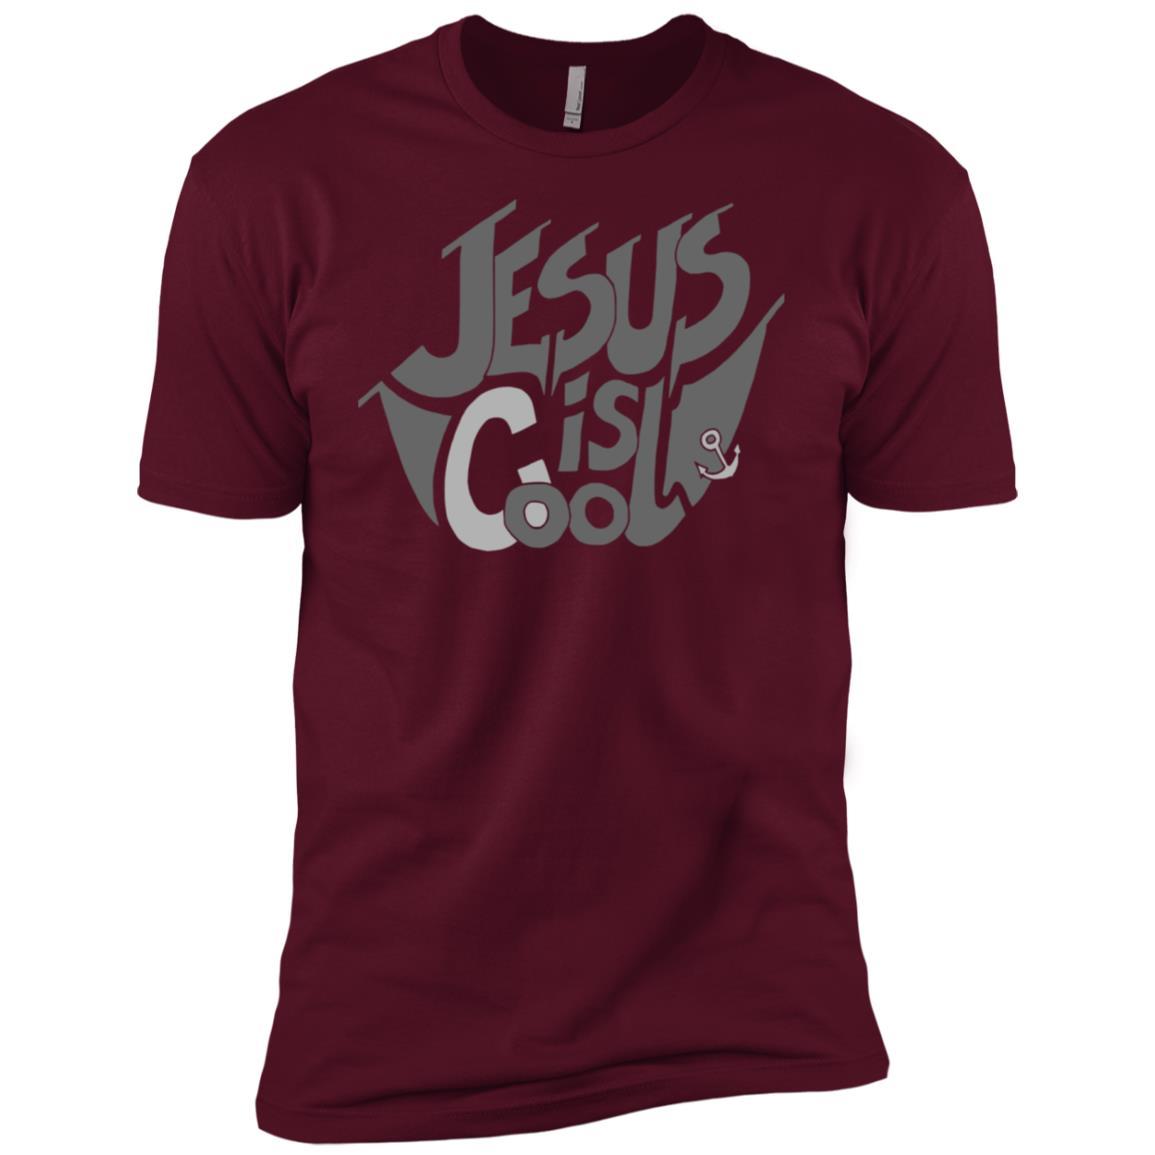 Jesus is Cool – Christian Design Women, Men, Kids Men Short Sleeve T-Shirt